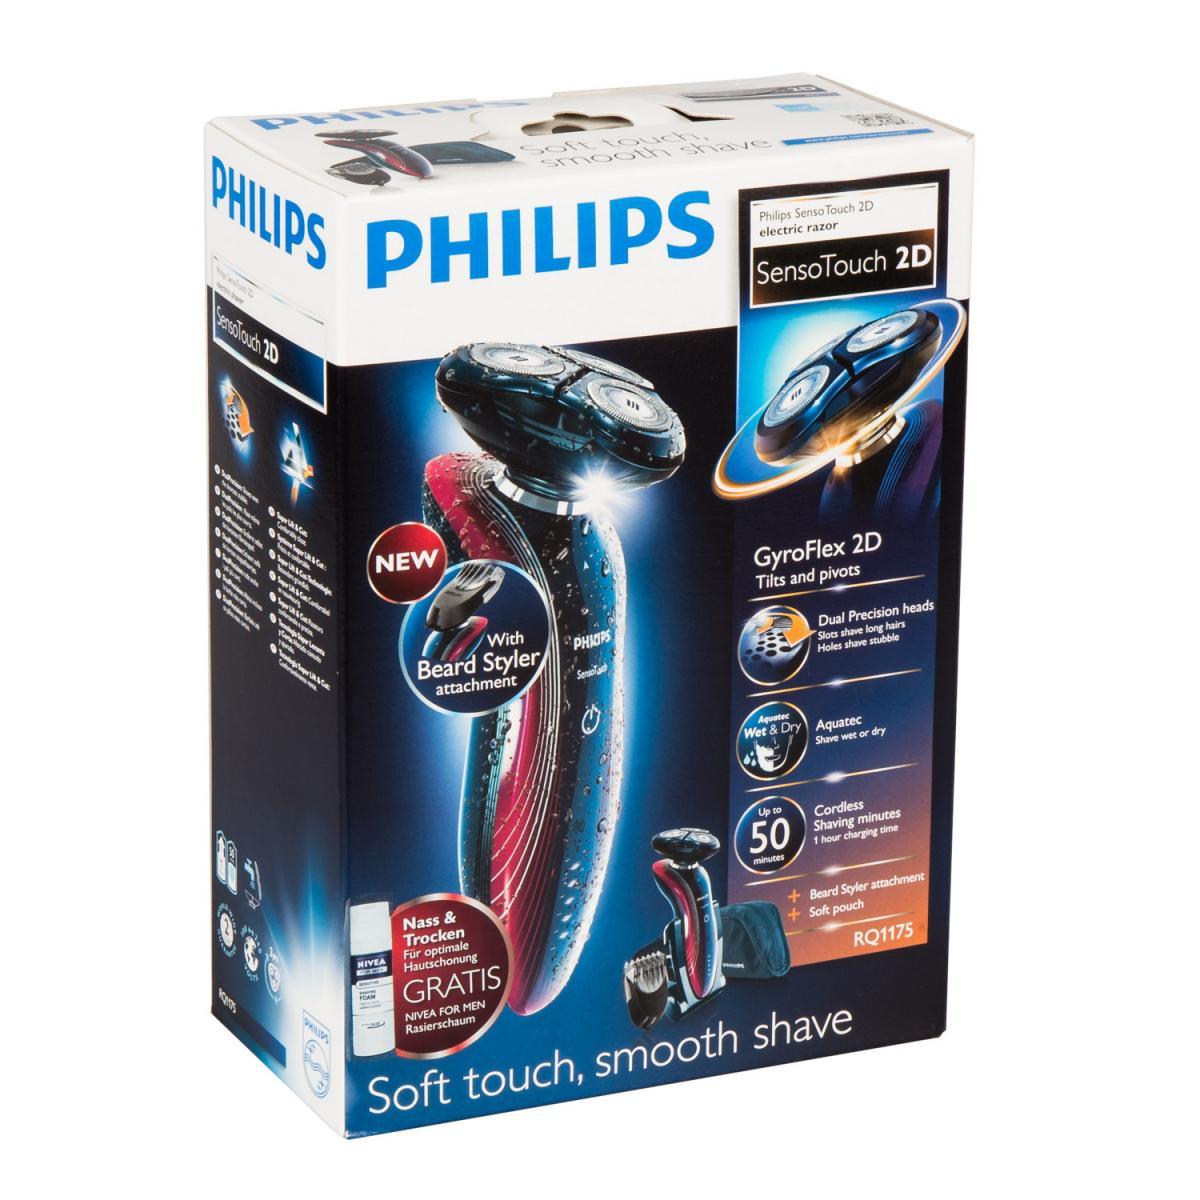 Liverpool; Rasuradora Philips 60%